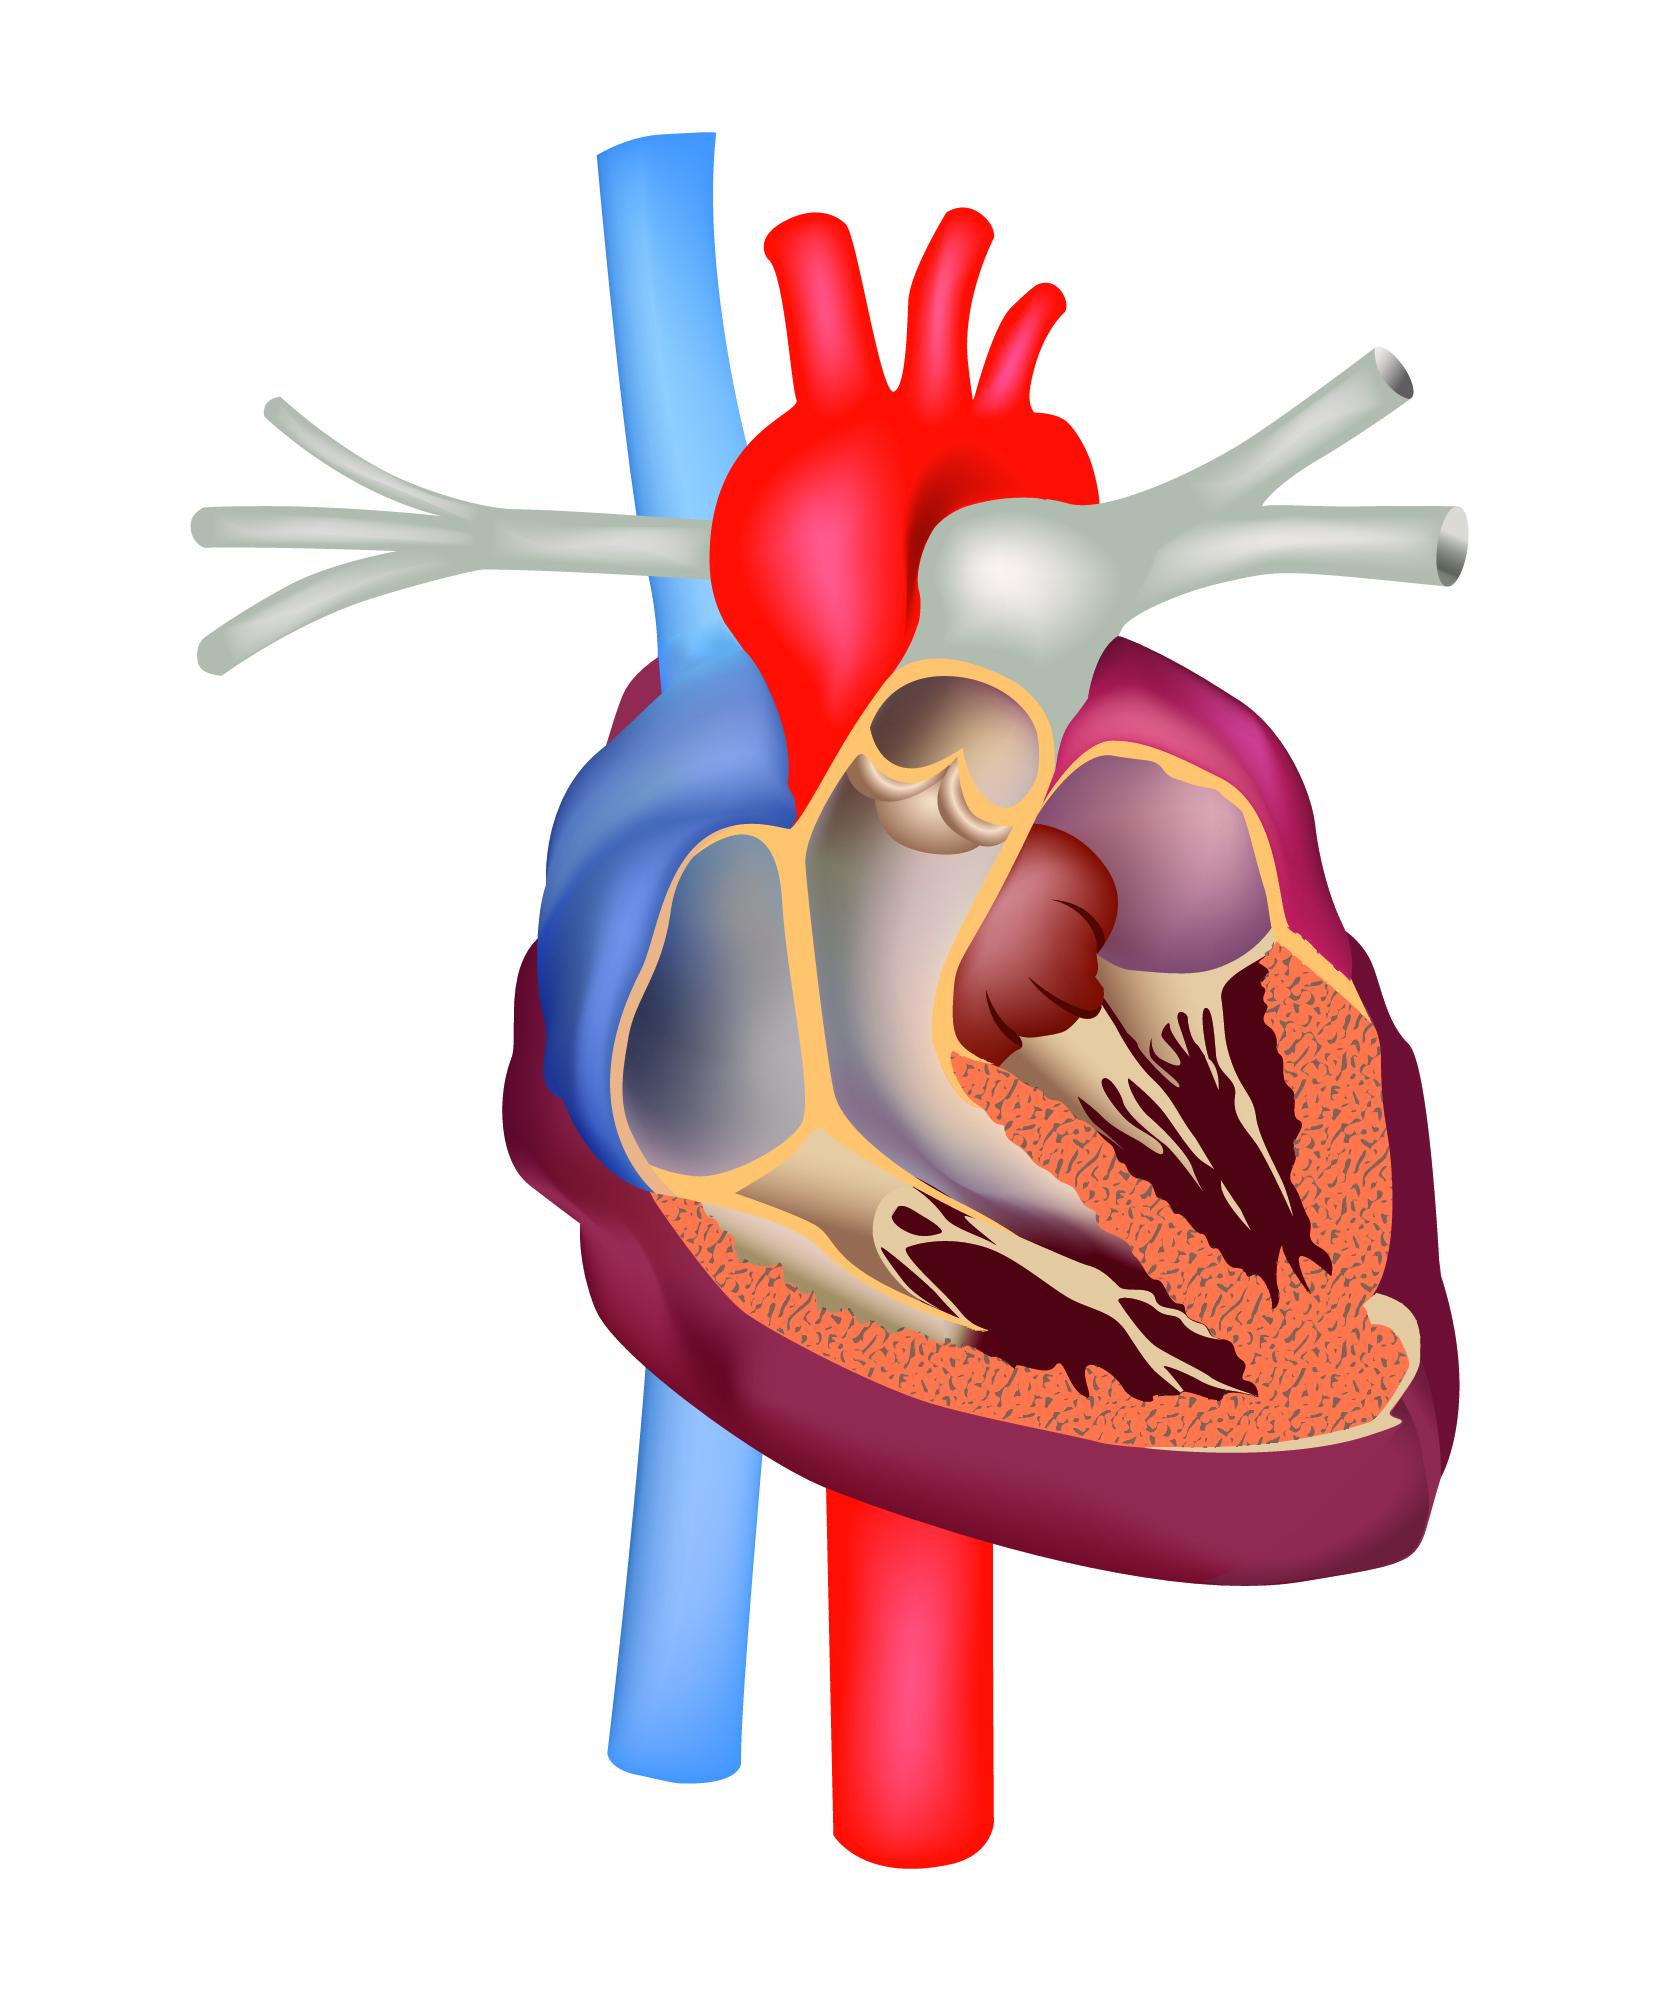 Válvula cardíaca